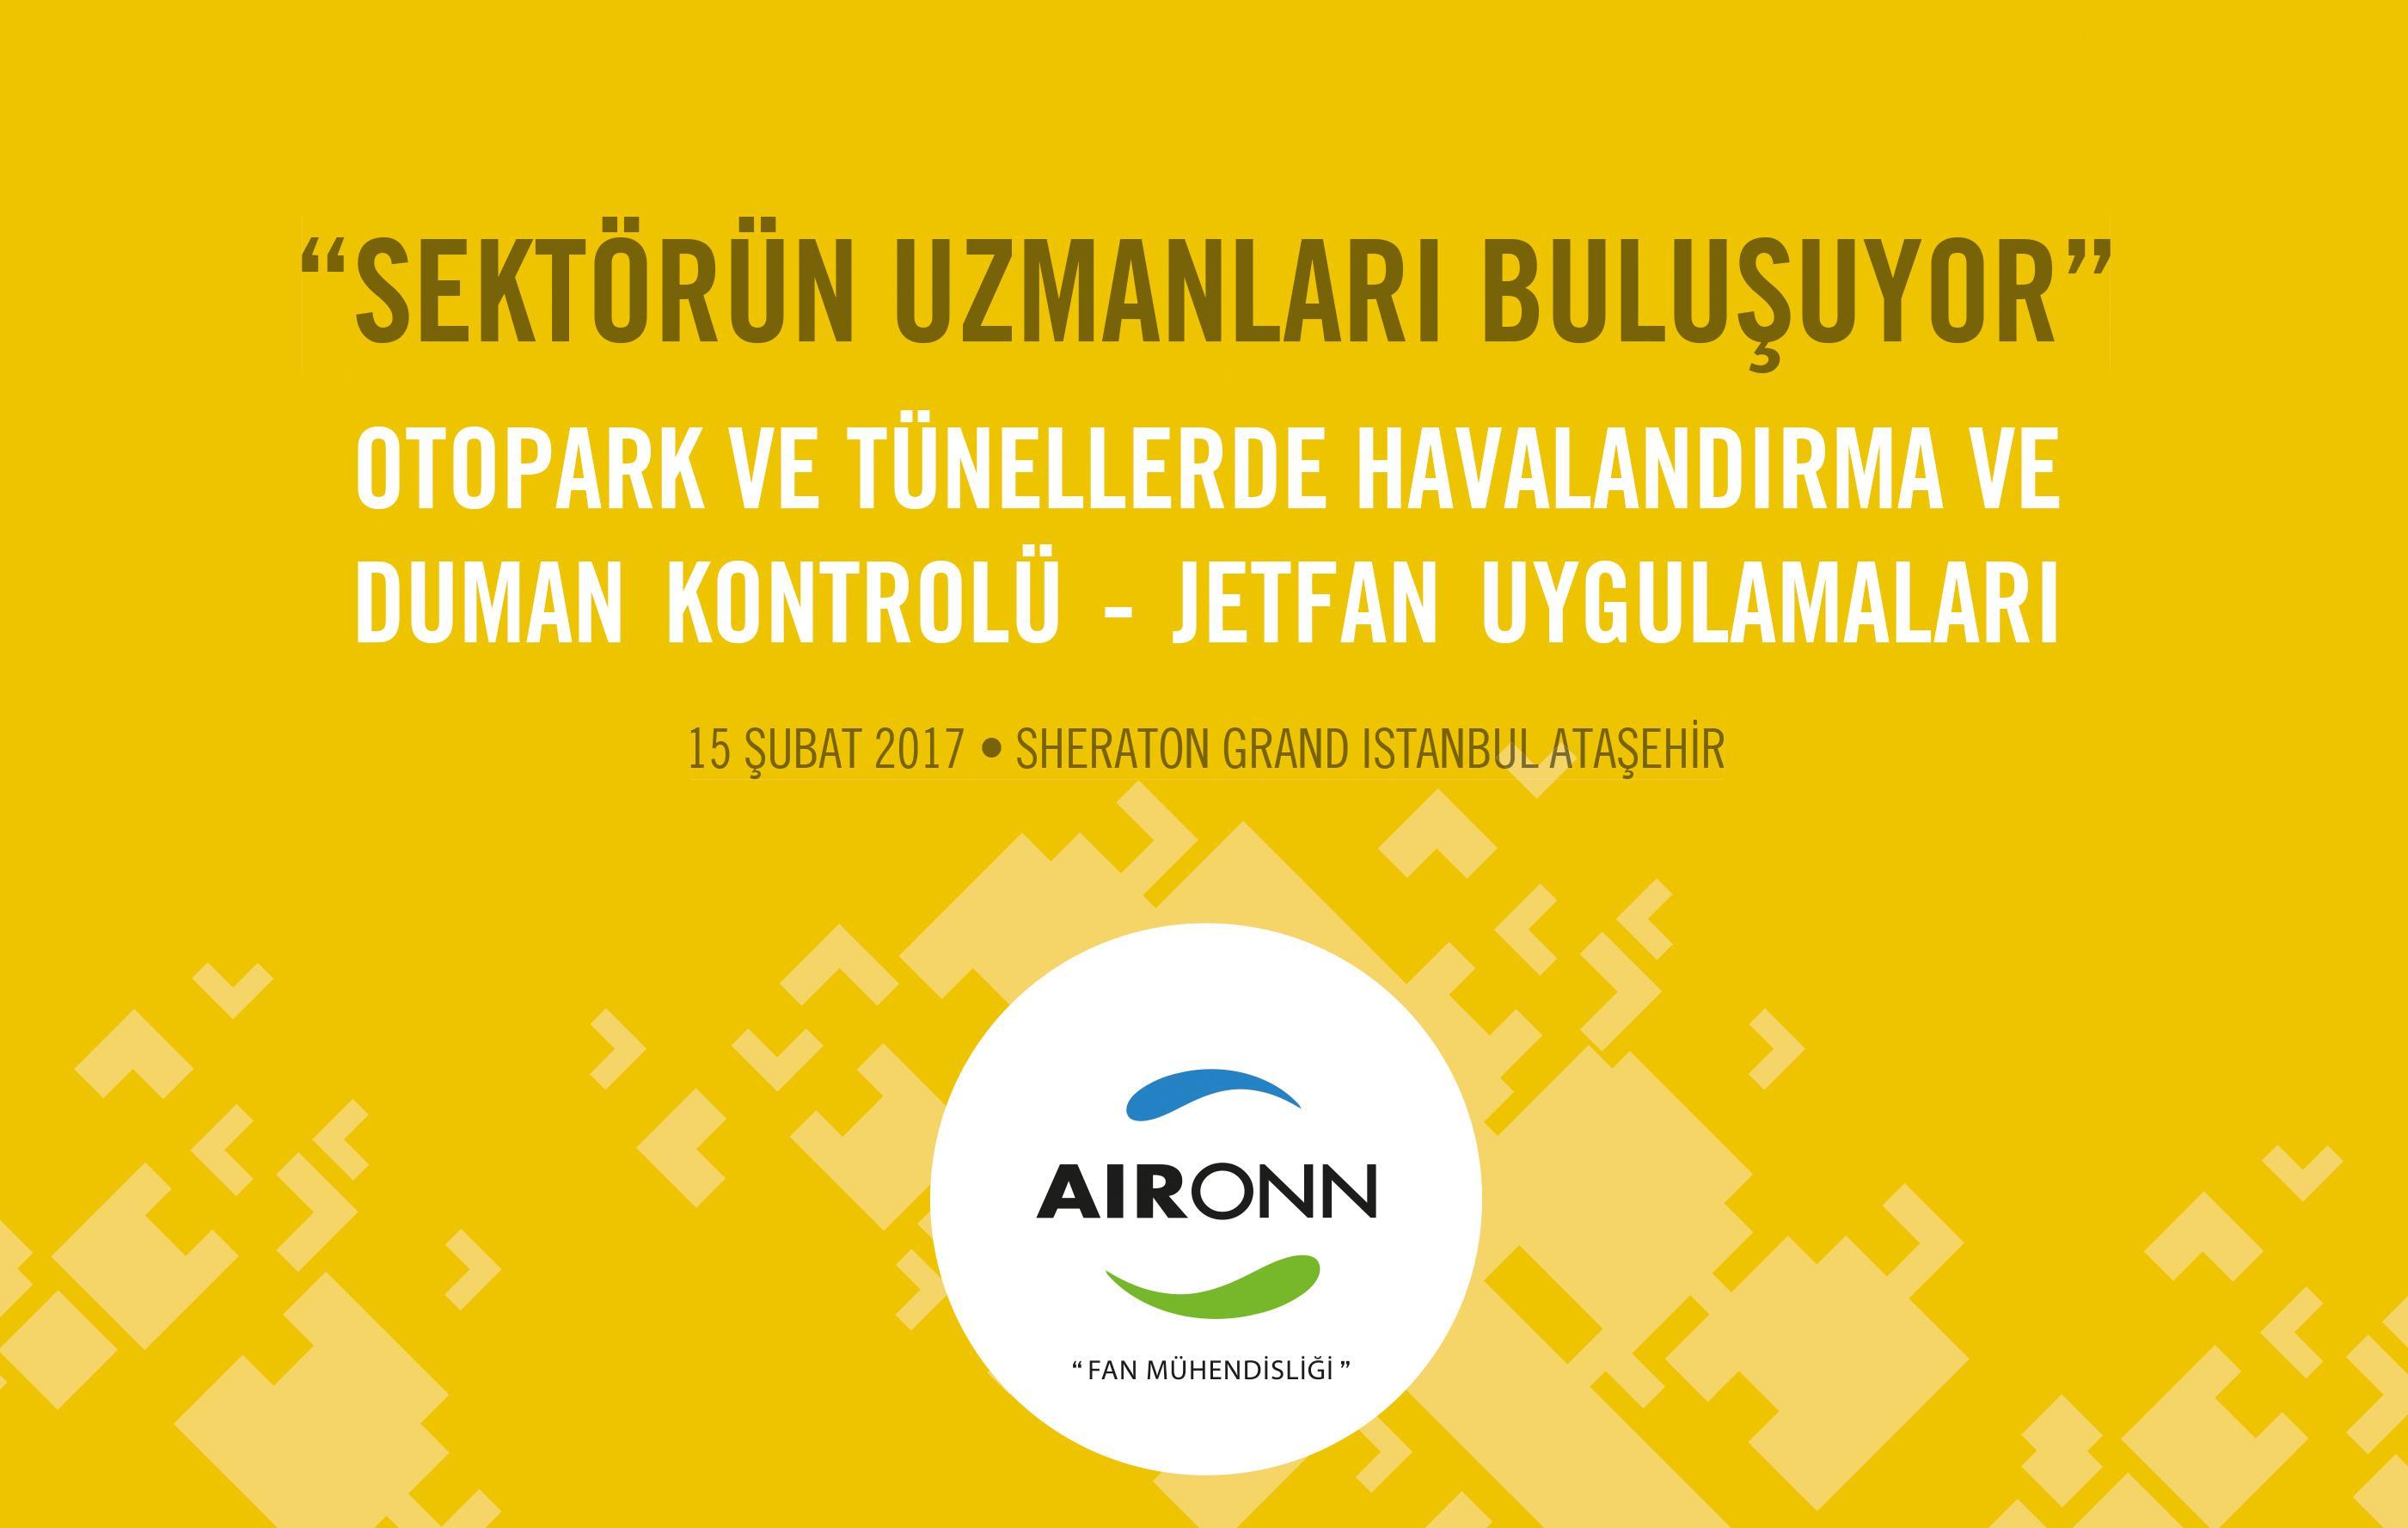 great intereset for Aironn seminar named